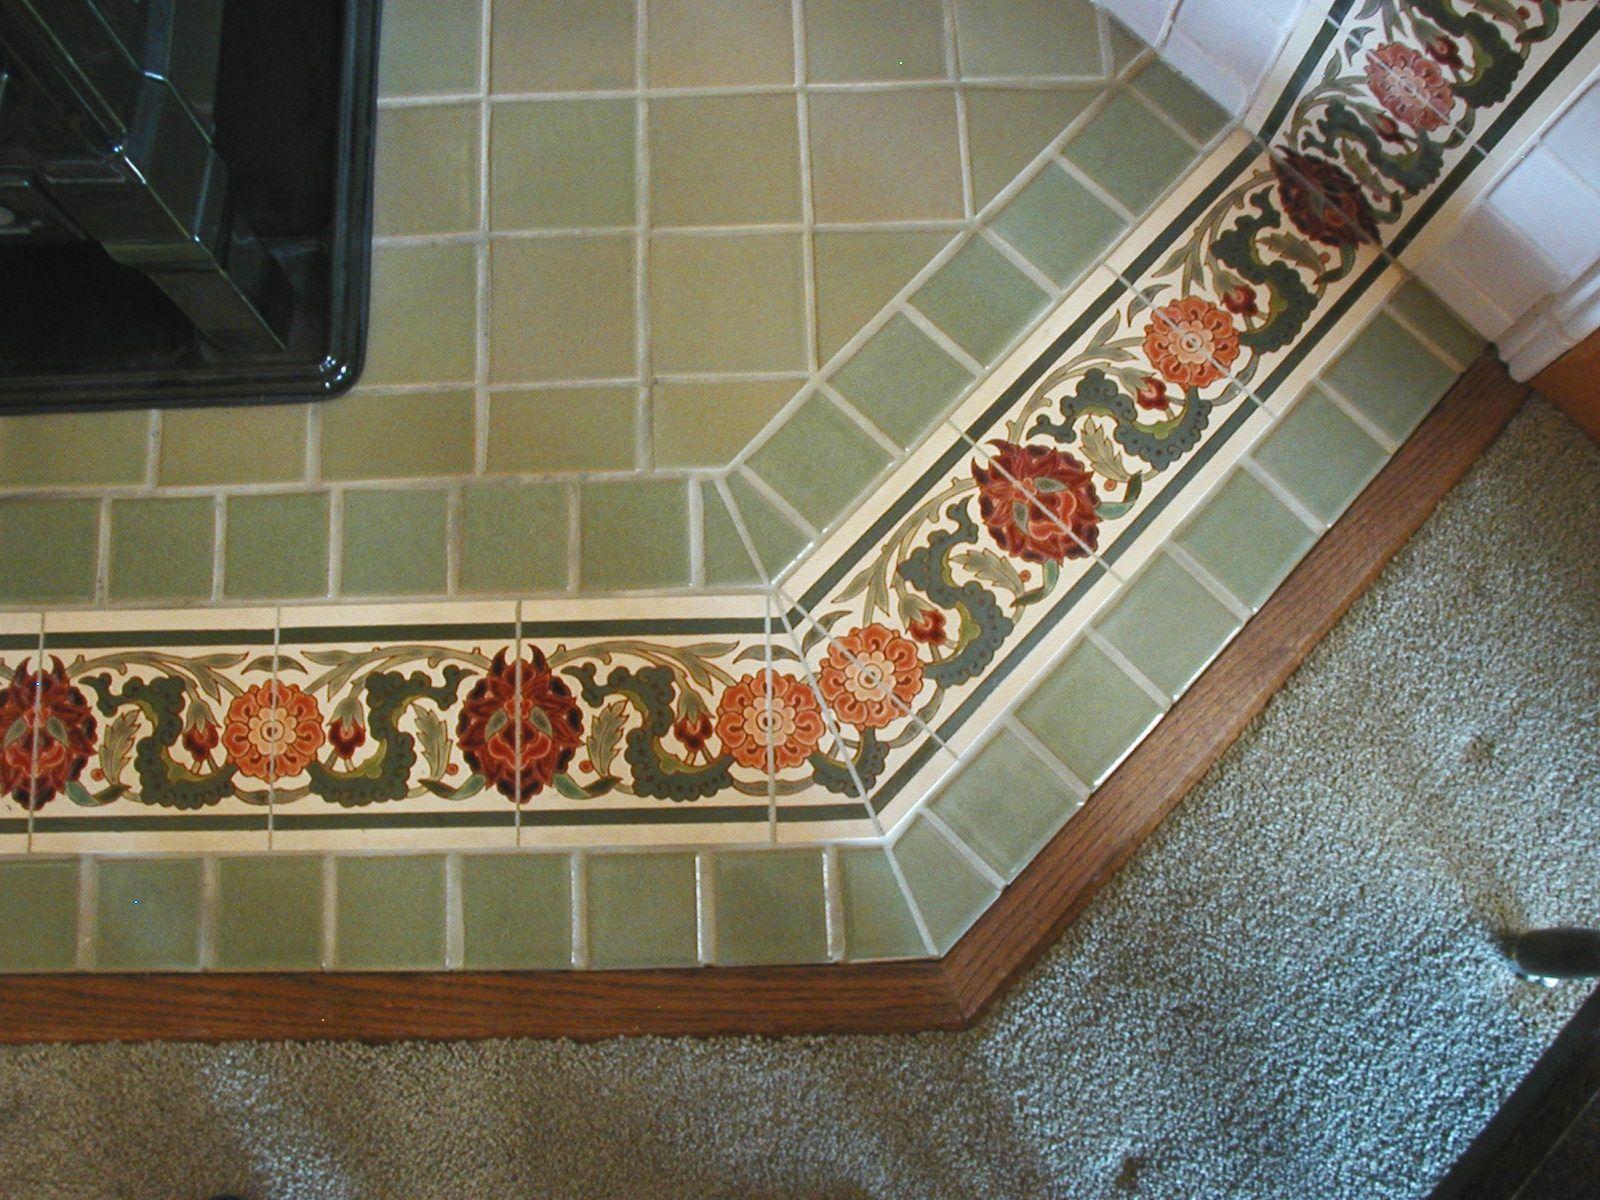 Weso ceramic tile stove images tile flooring design ideas ceramic tile wood stove gallery tile flooring design ideas ceramic tile stoves choice image tile flooring doublecrazyfo Gallery